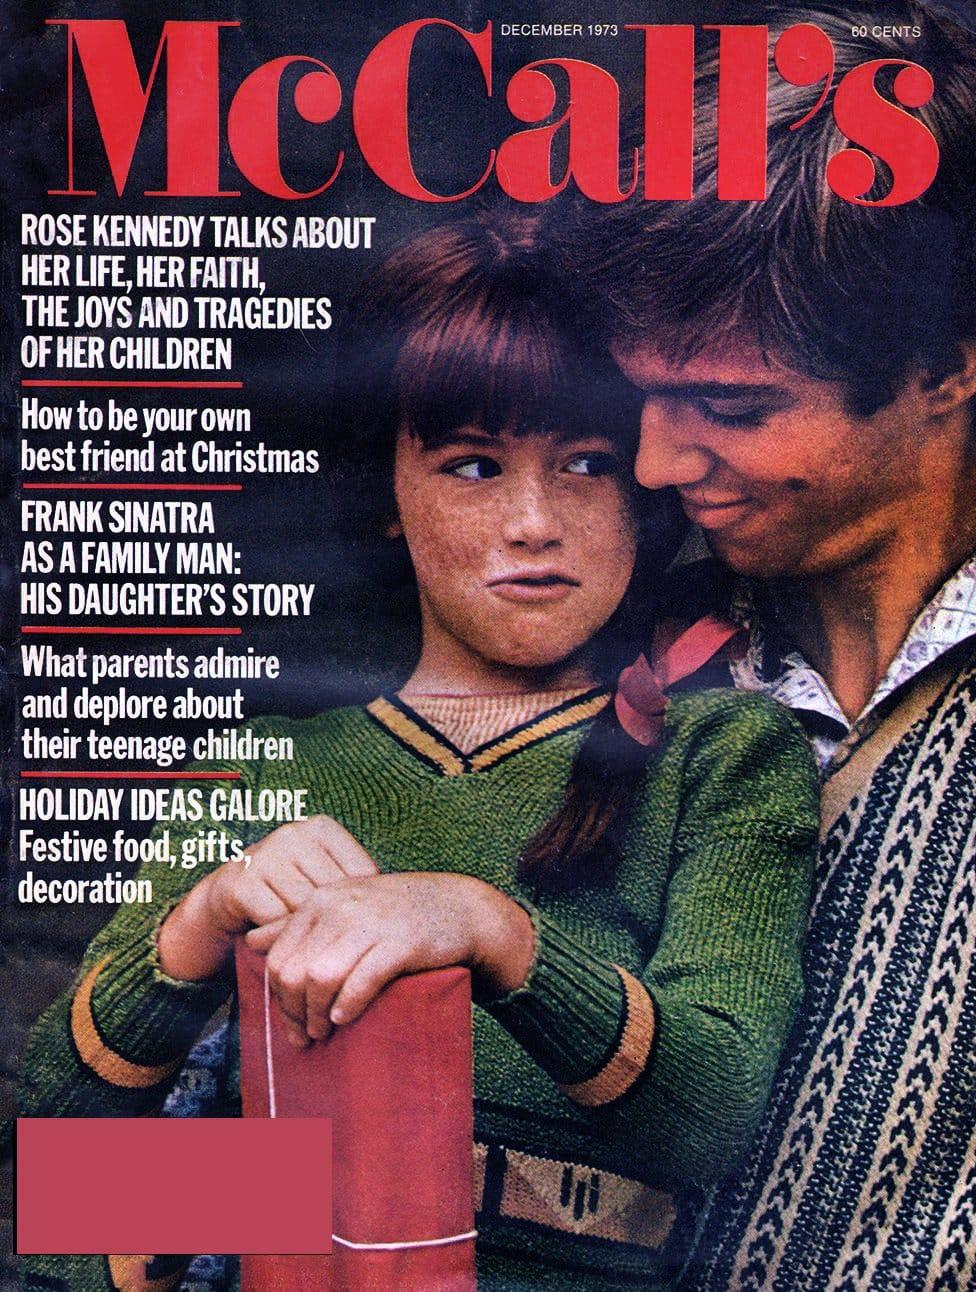 The Waltons McCalls magazine cover (1973)